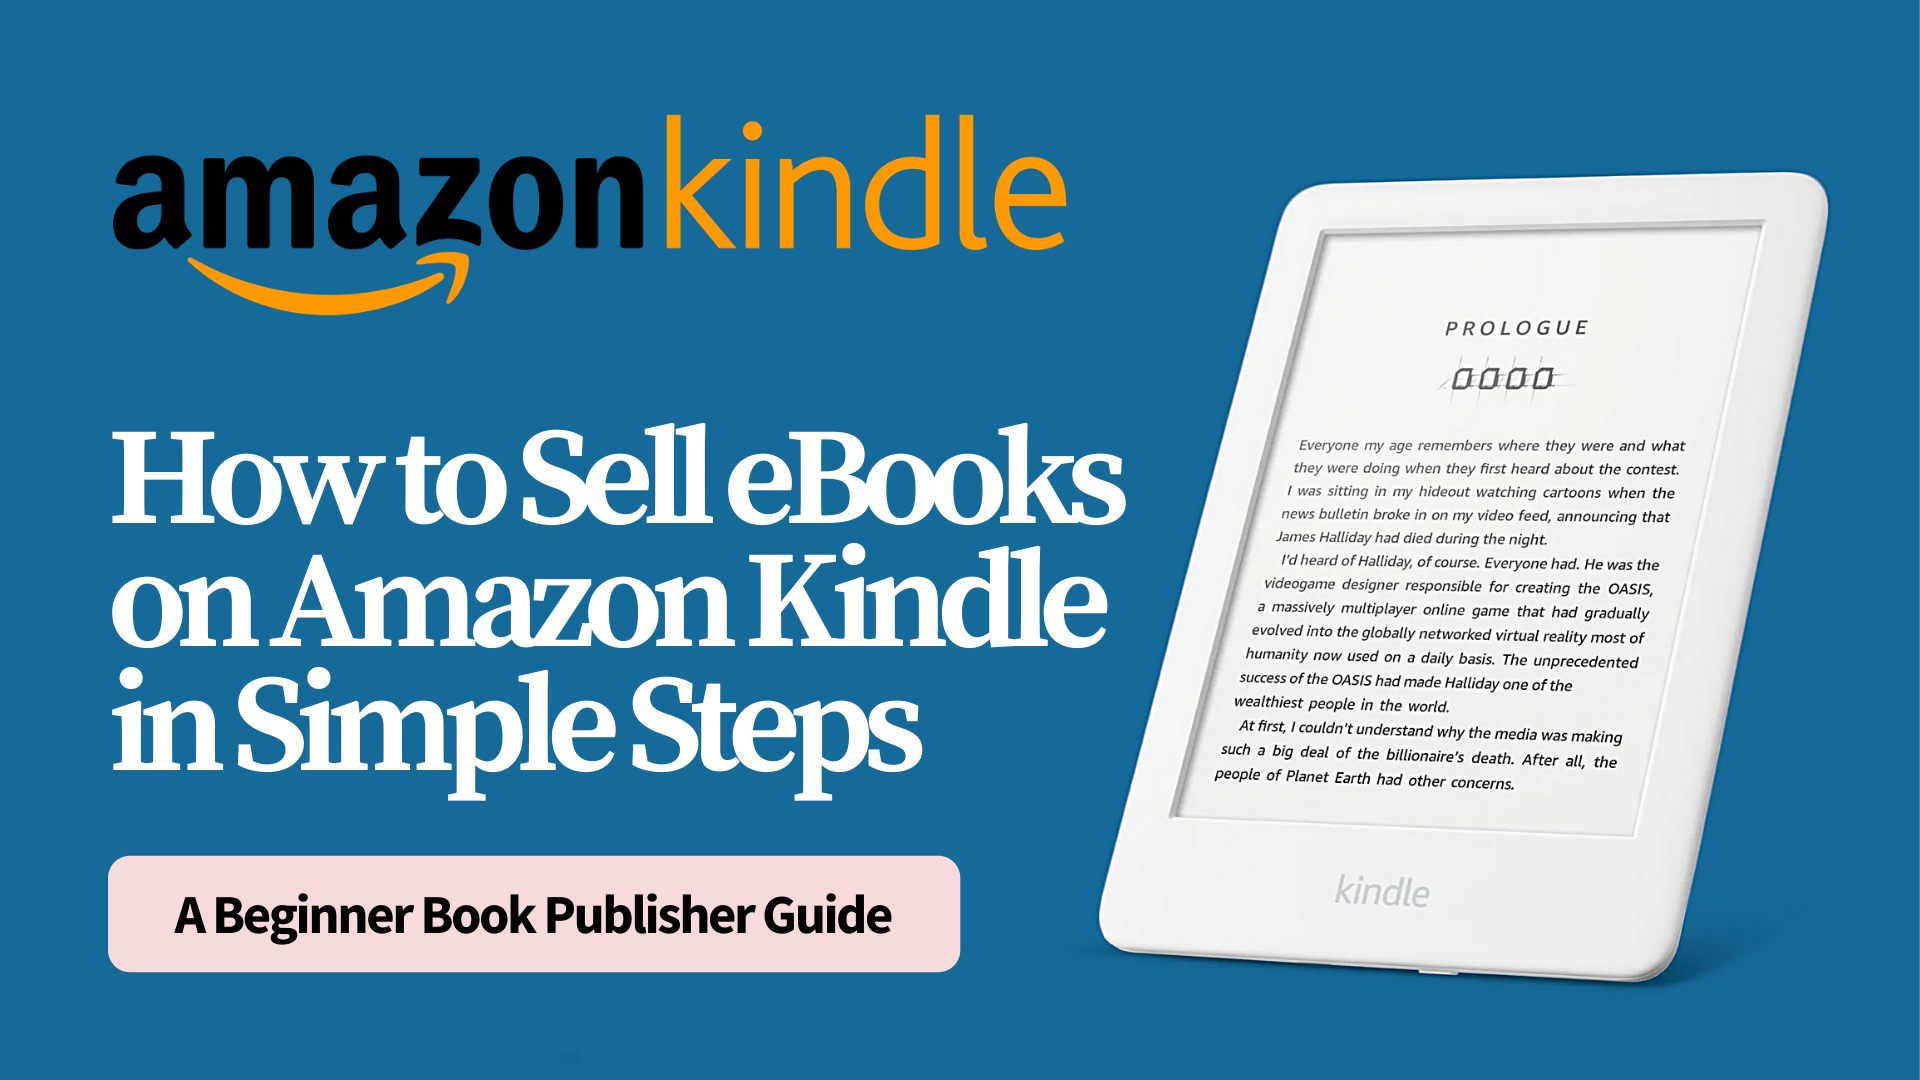 How to Sell eBooks on Amazon Kindle